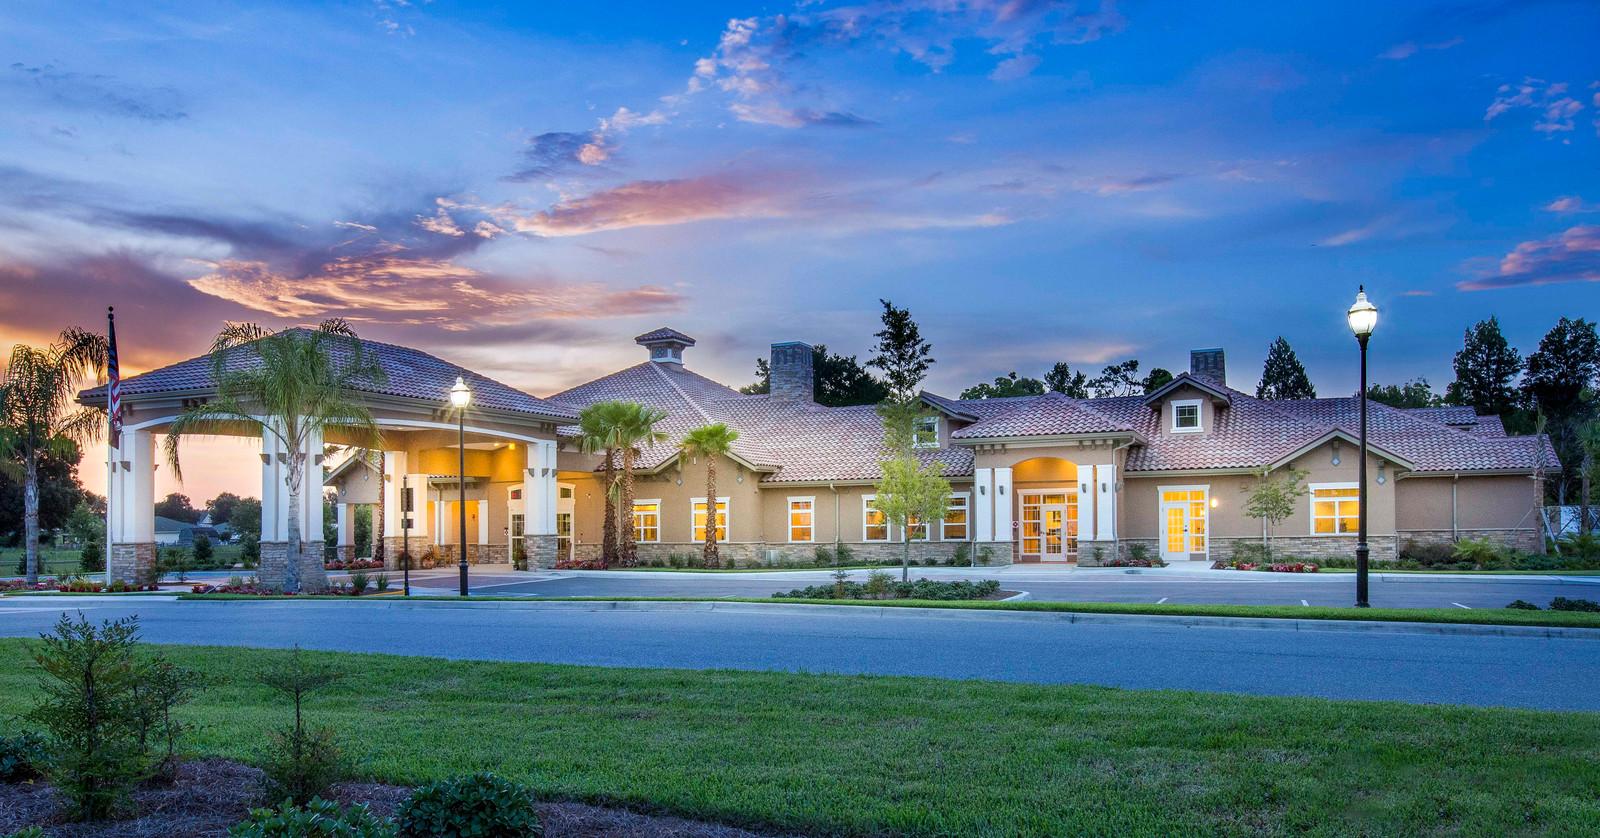 Senior Living Architectural Concepts Inc United States